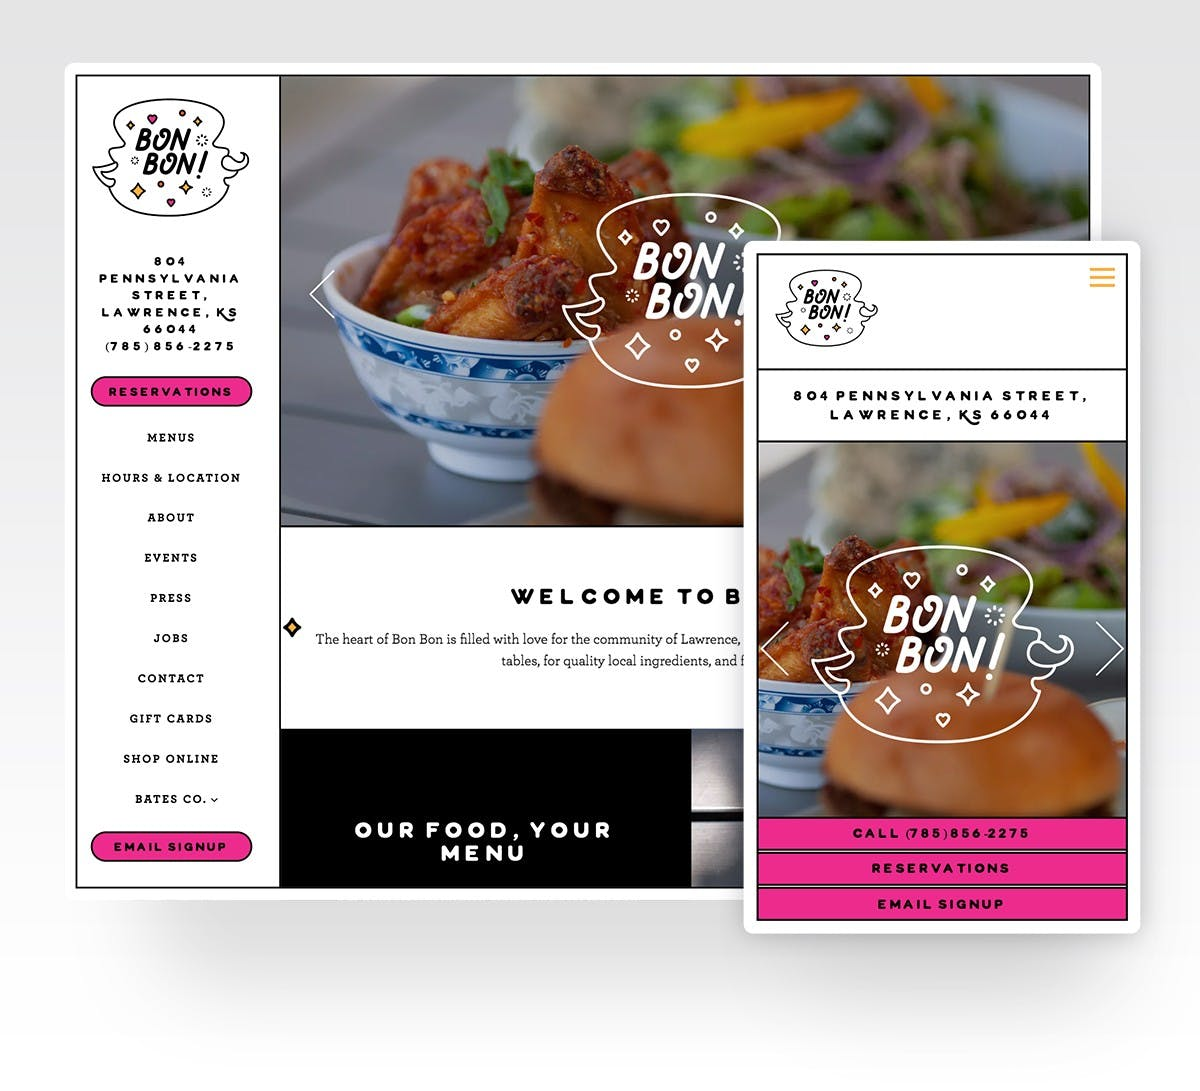 Bon Bon's website